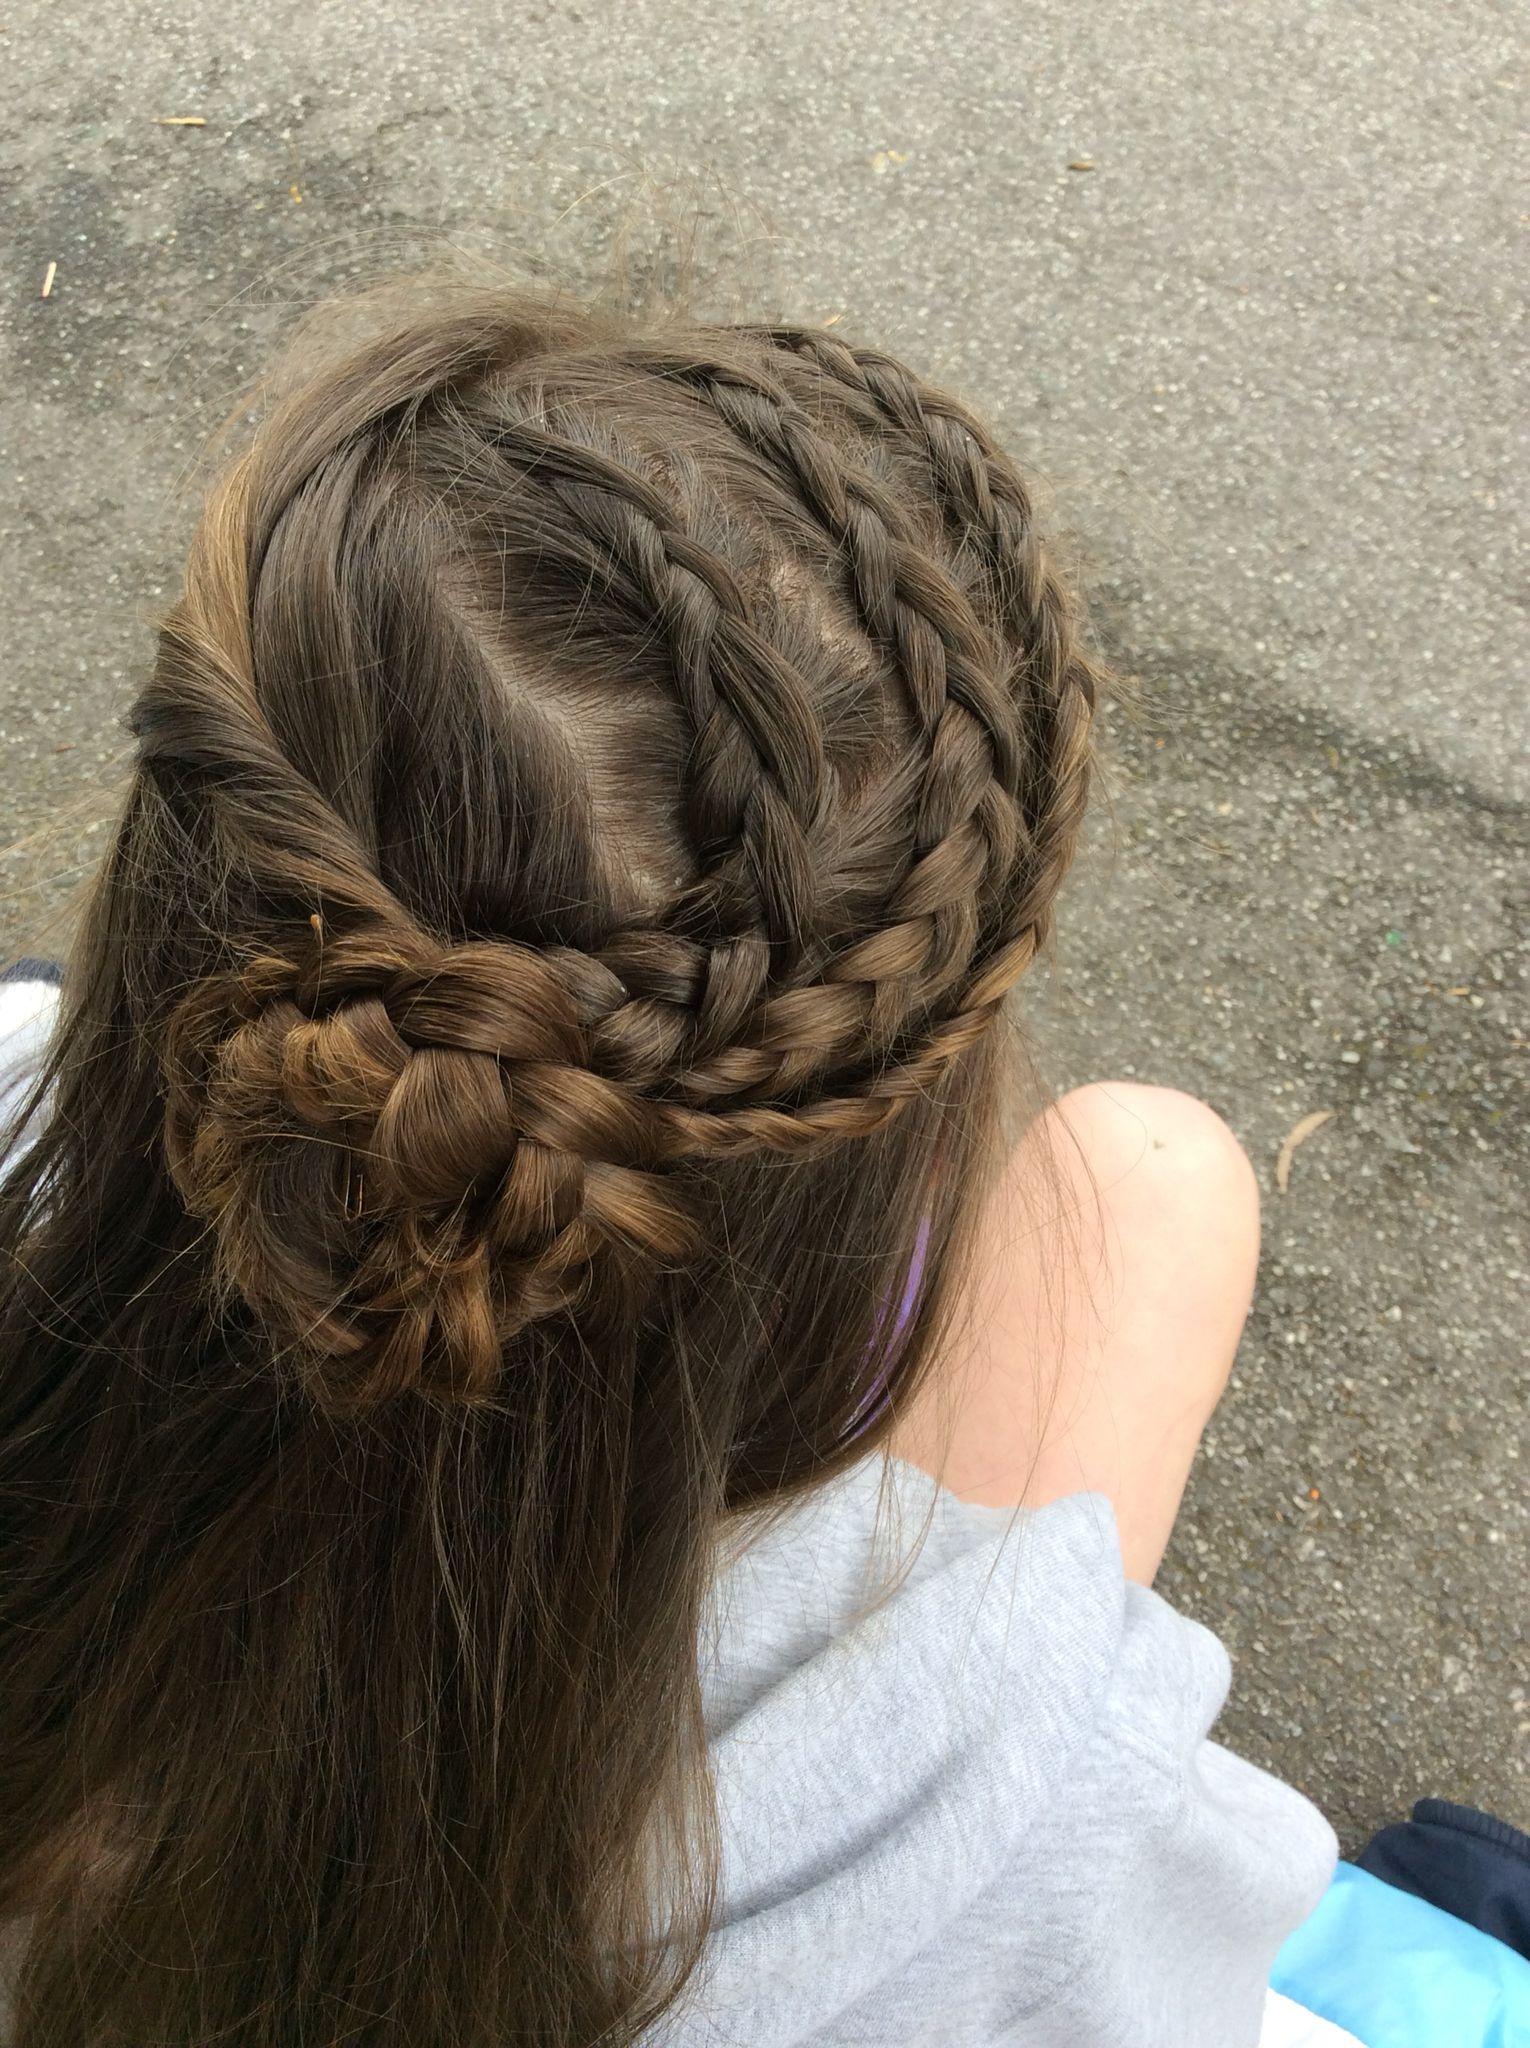 Triple braid rose #styledbyme Credits to #missysue | Hair styles, Braids, My hair